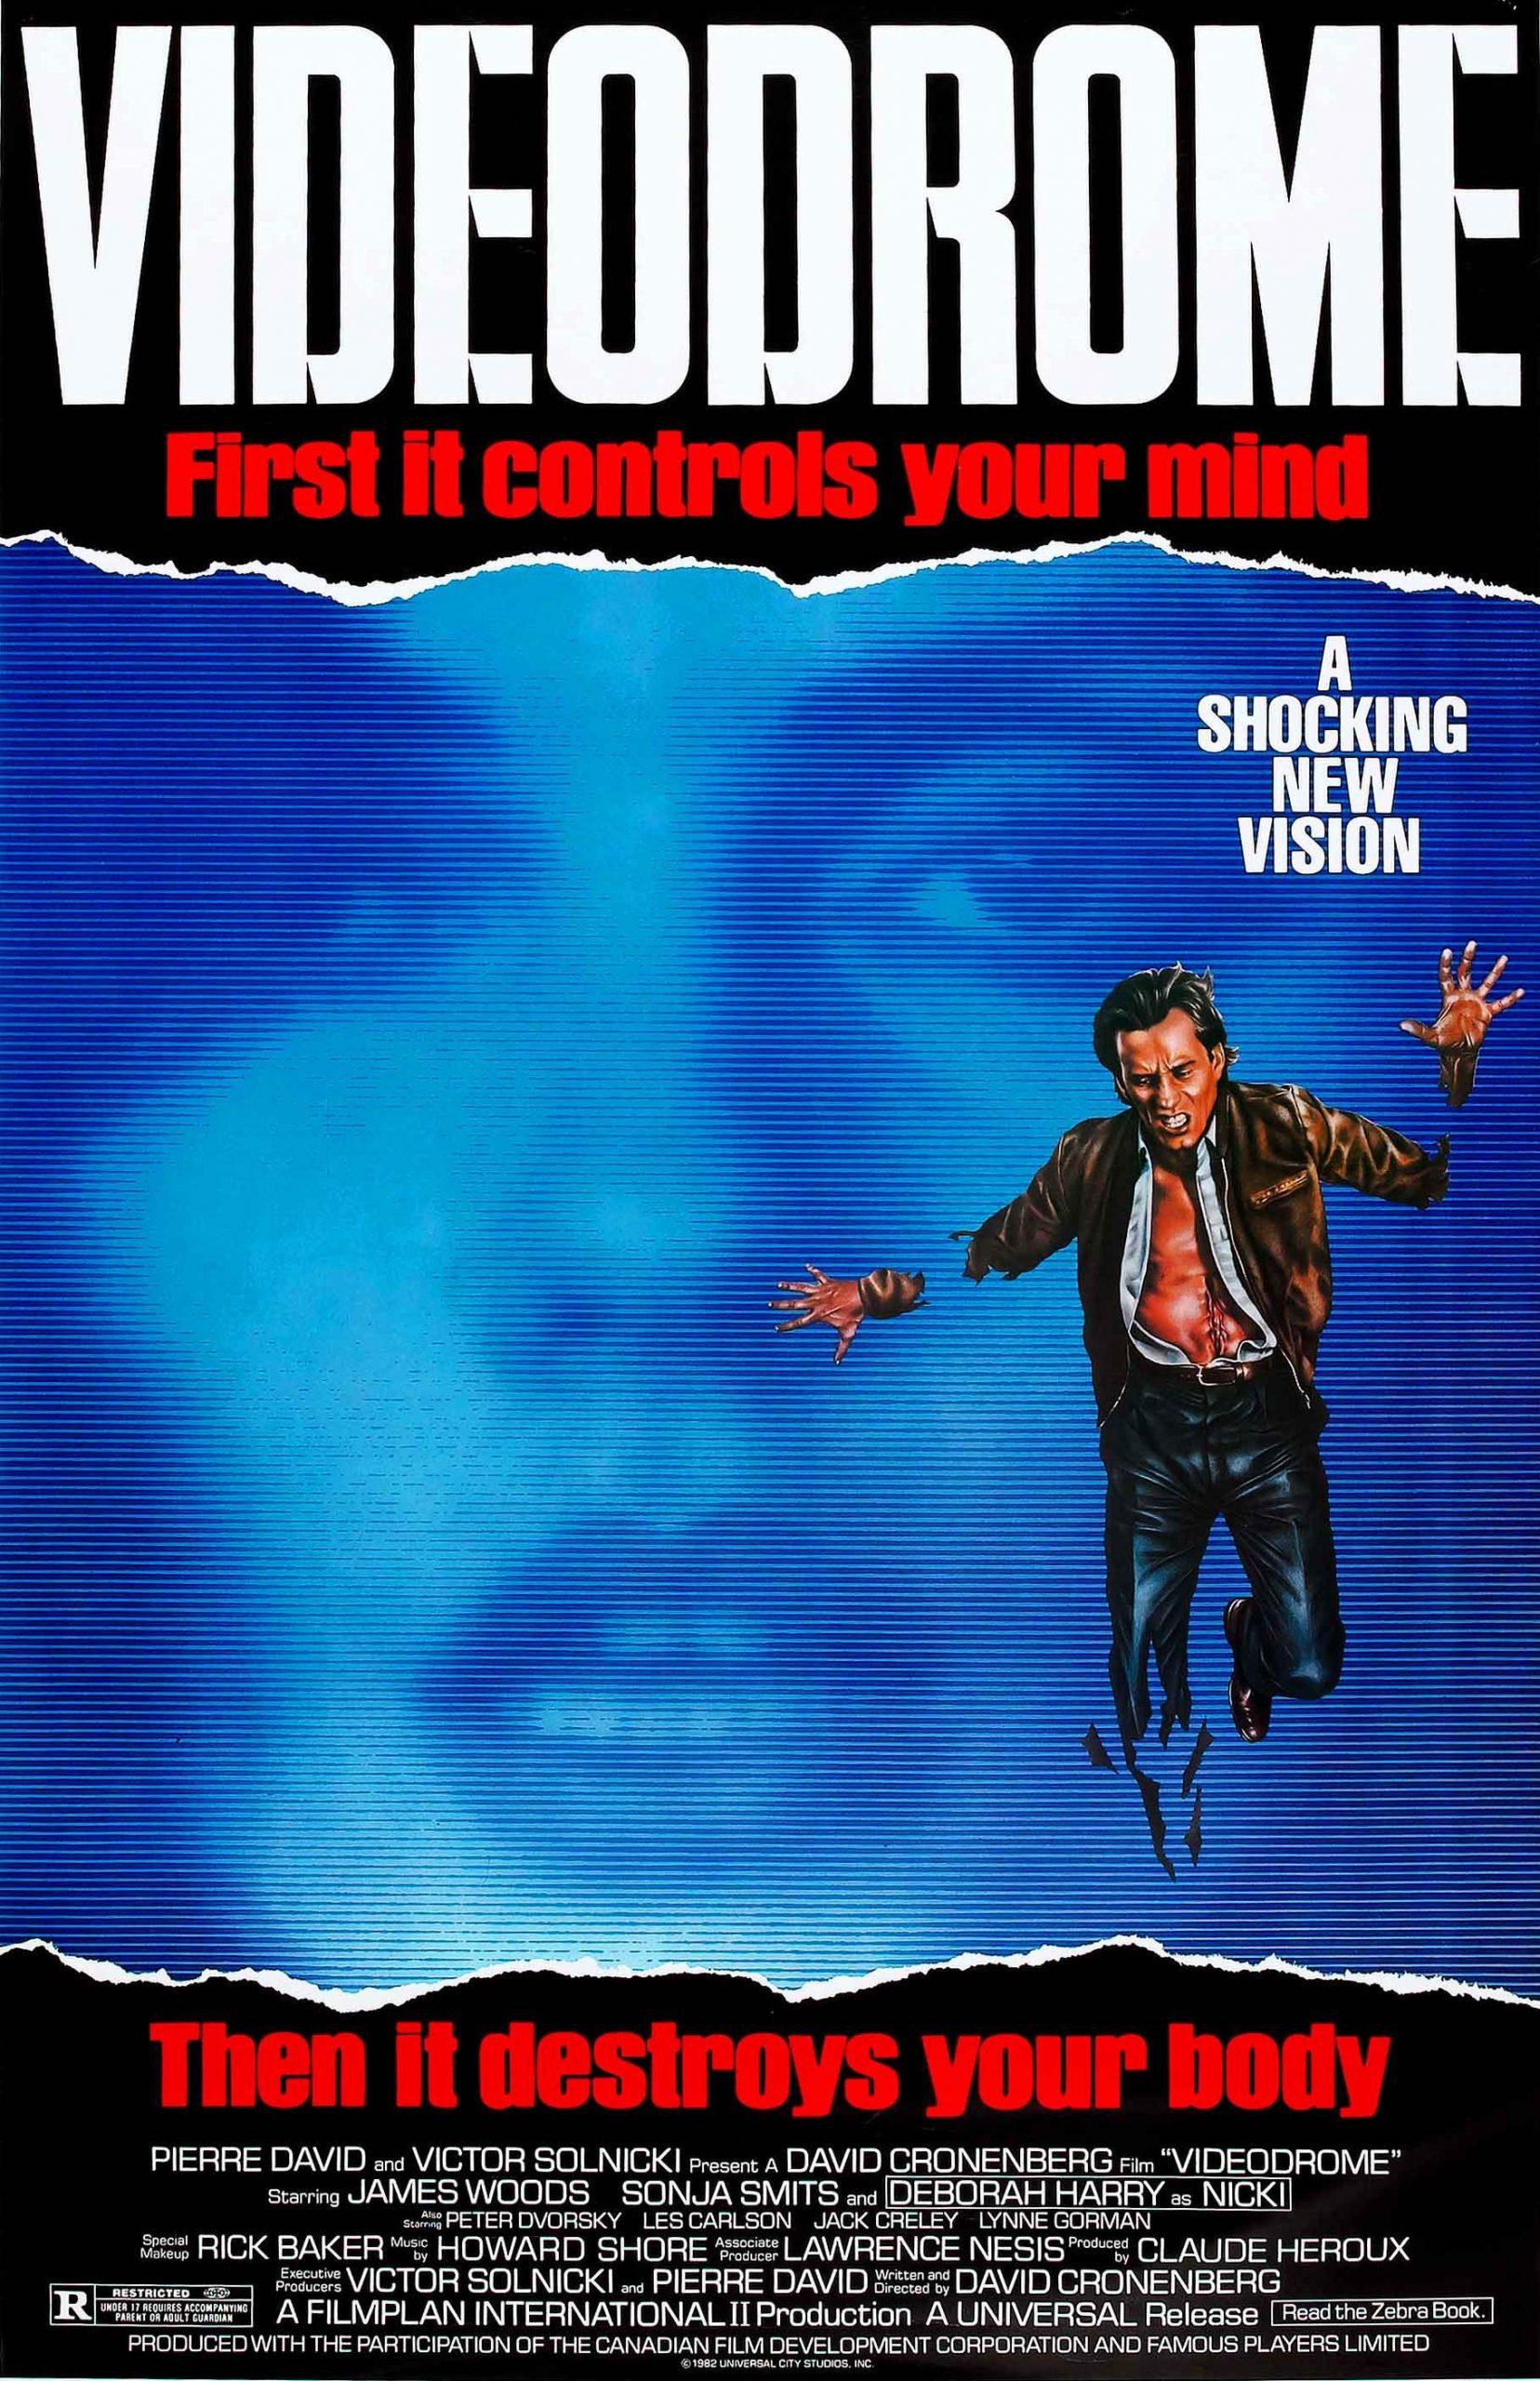 Cult Media: The Stunning Prescience Of 1983's VIDEODROME In The Digital Propaganda Age